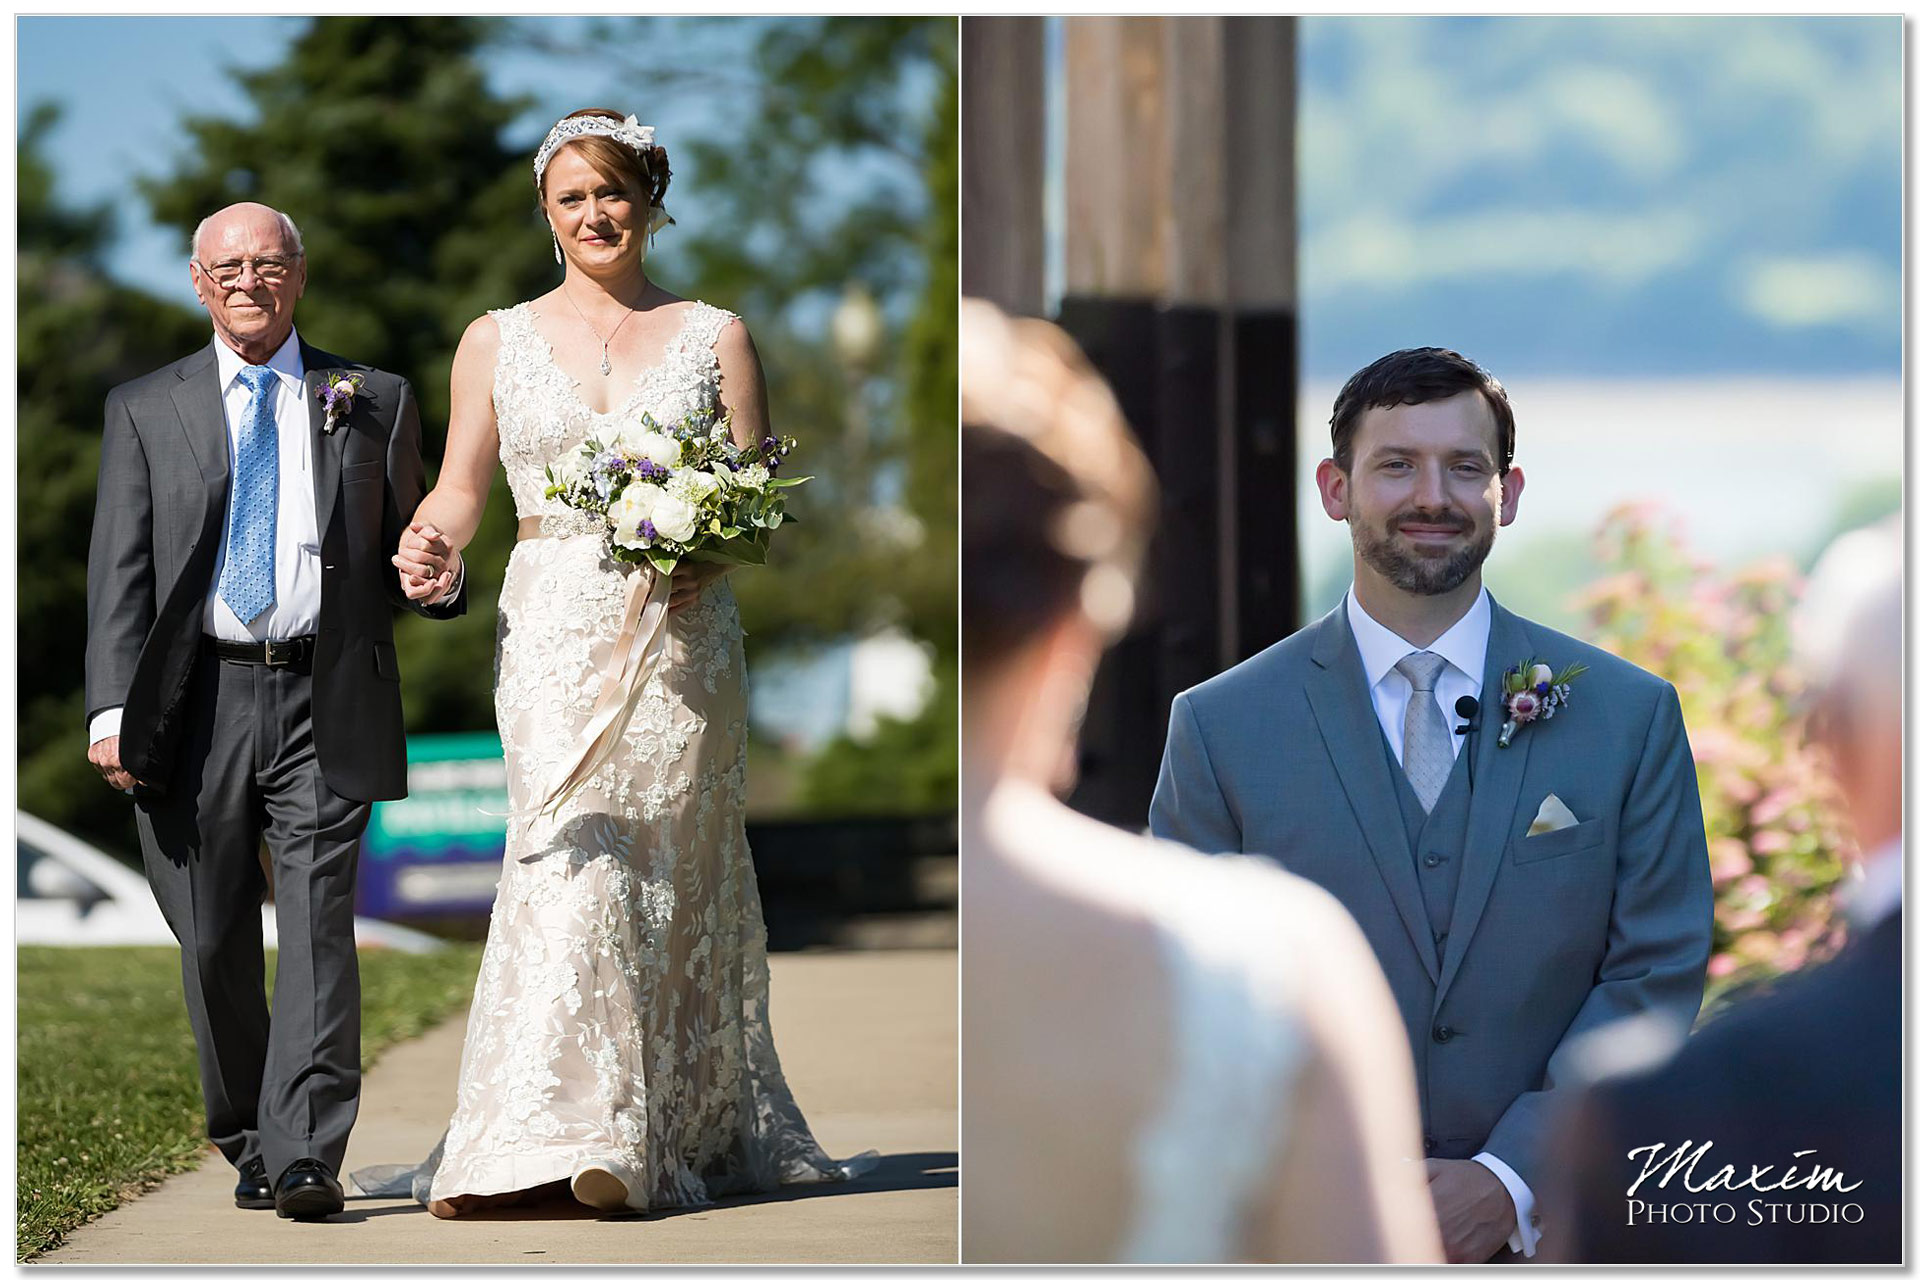 Alms Park Bride Groom Cincinnati wedding